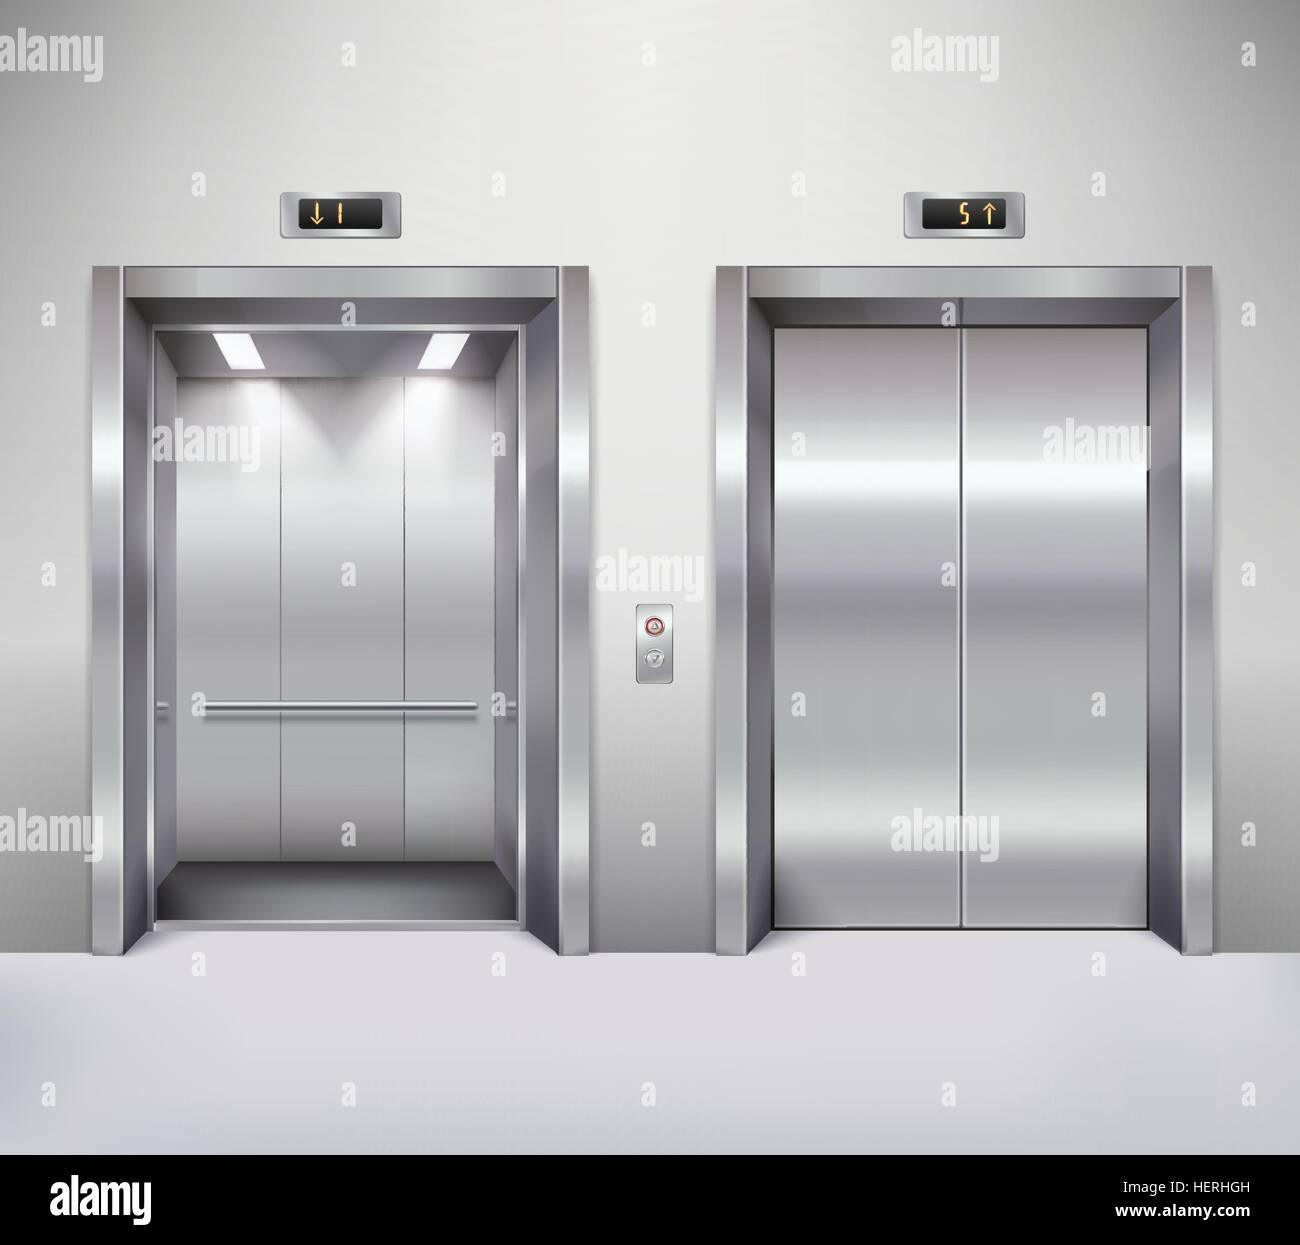 Elevator Door Illustration Open And Closed Chrome Metal